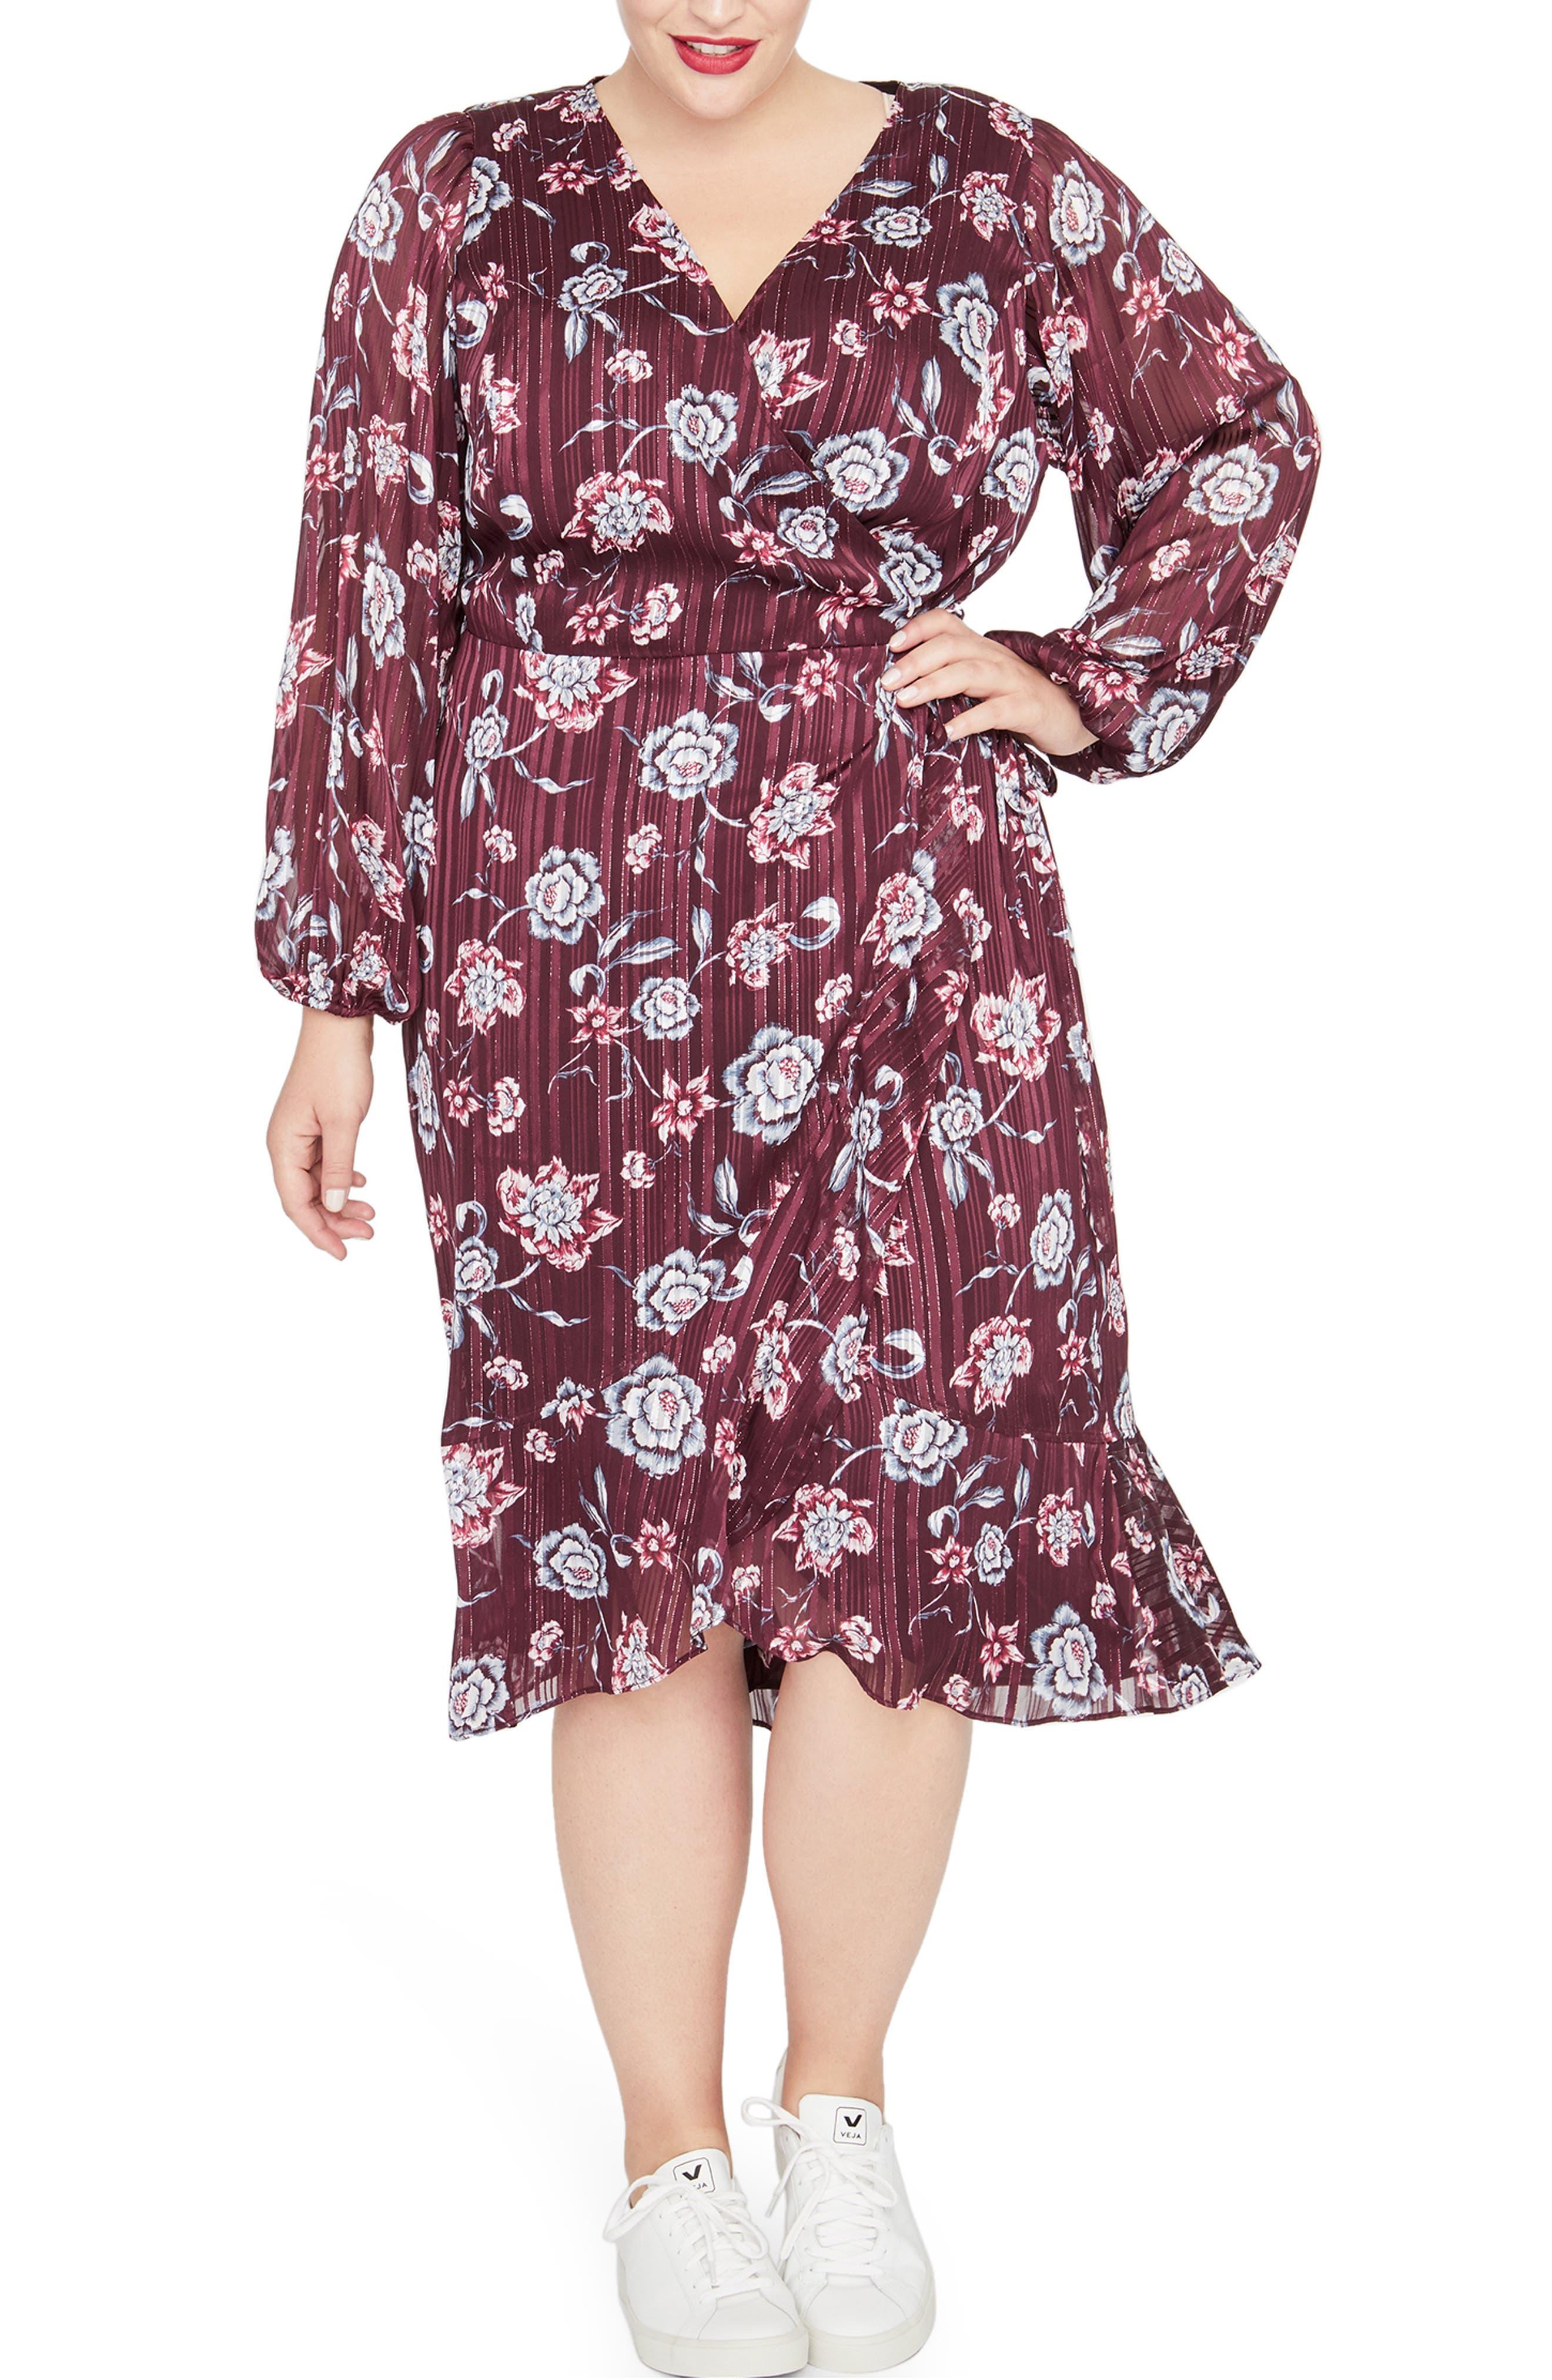 Plus Size Rachel Rachel Roy Gisela Floral Metalllic Detail Dress, Blue